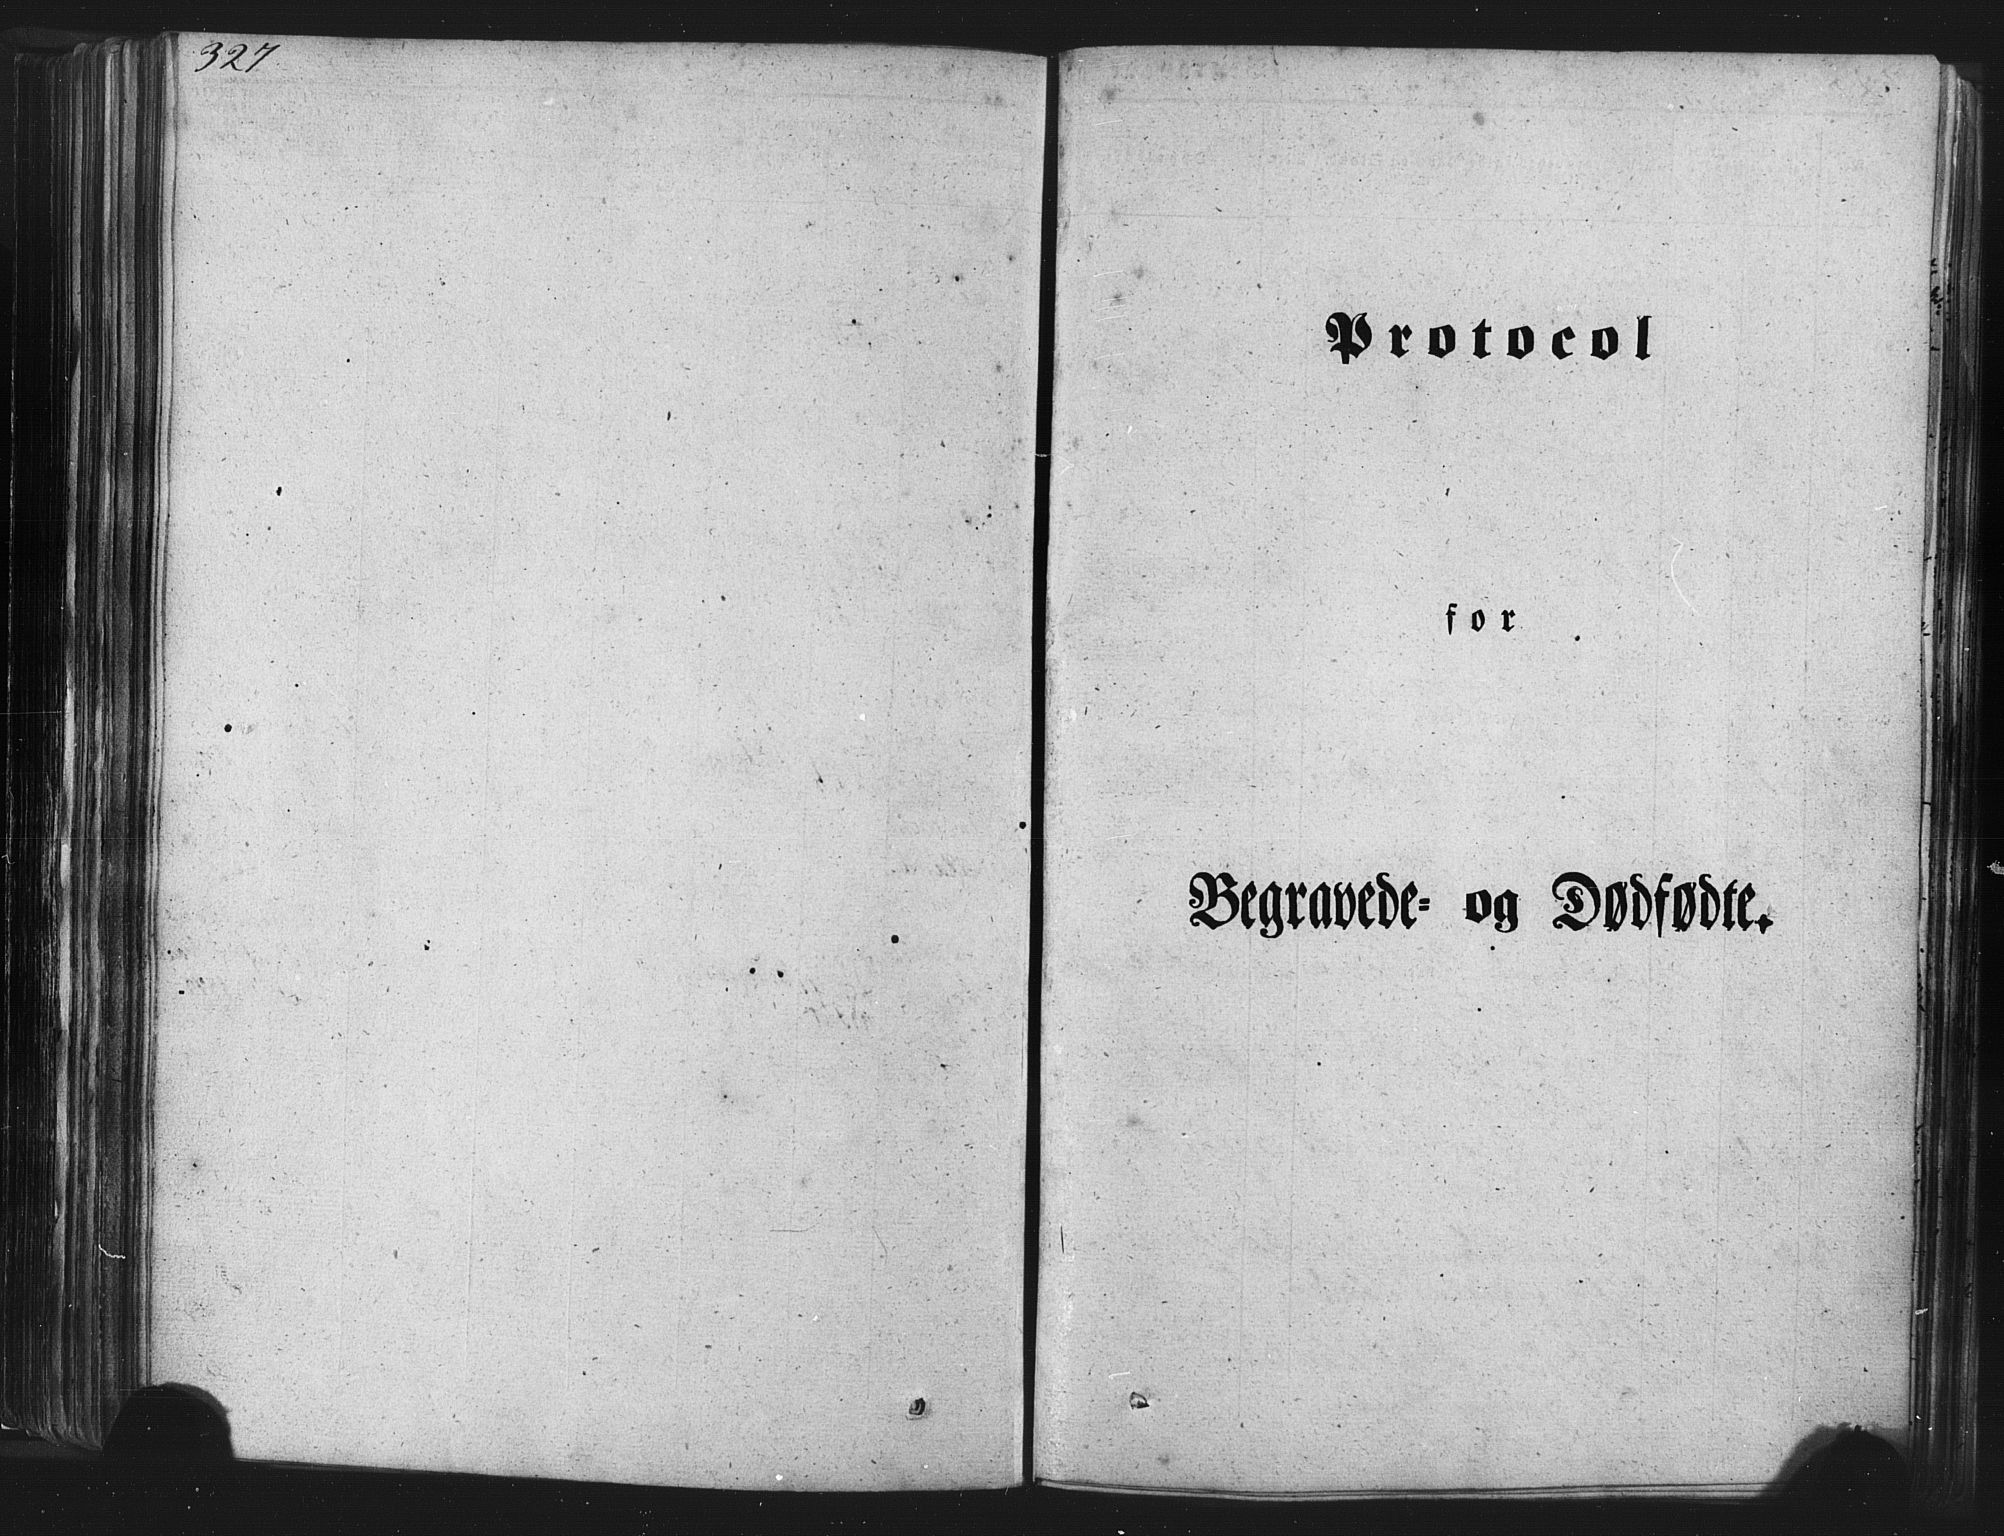 SAT, Ministerialprotokoller, klokkerbøker og fødselsregistre - Nordland, 839/L0567: Ministerialbok nr. 839A04, 1863-1879, s. 327